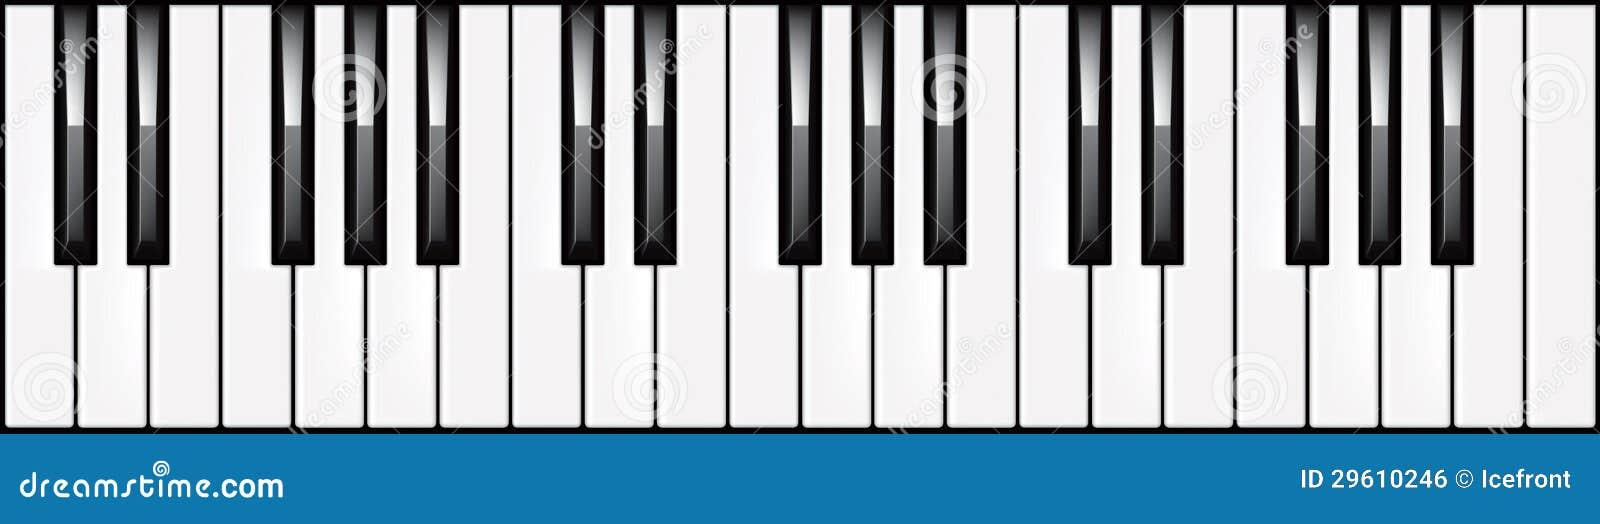 illustration de clavier de piano 3 octave illustration de. Black Bedroom Furniture Sets. Home Design Ideas